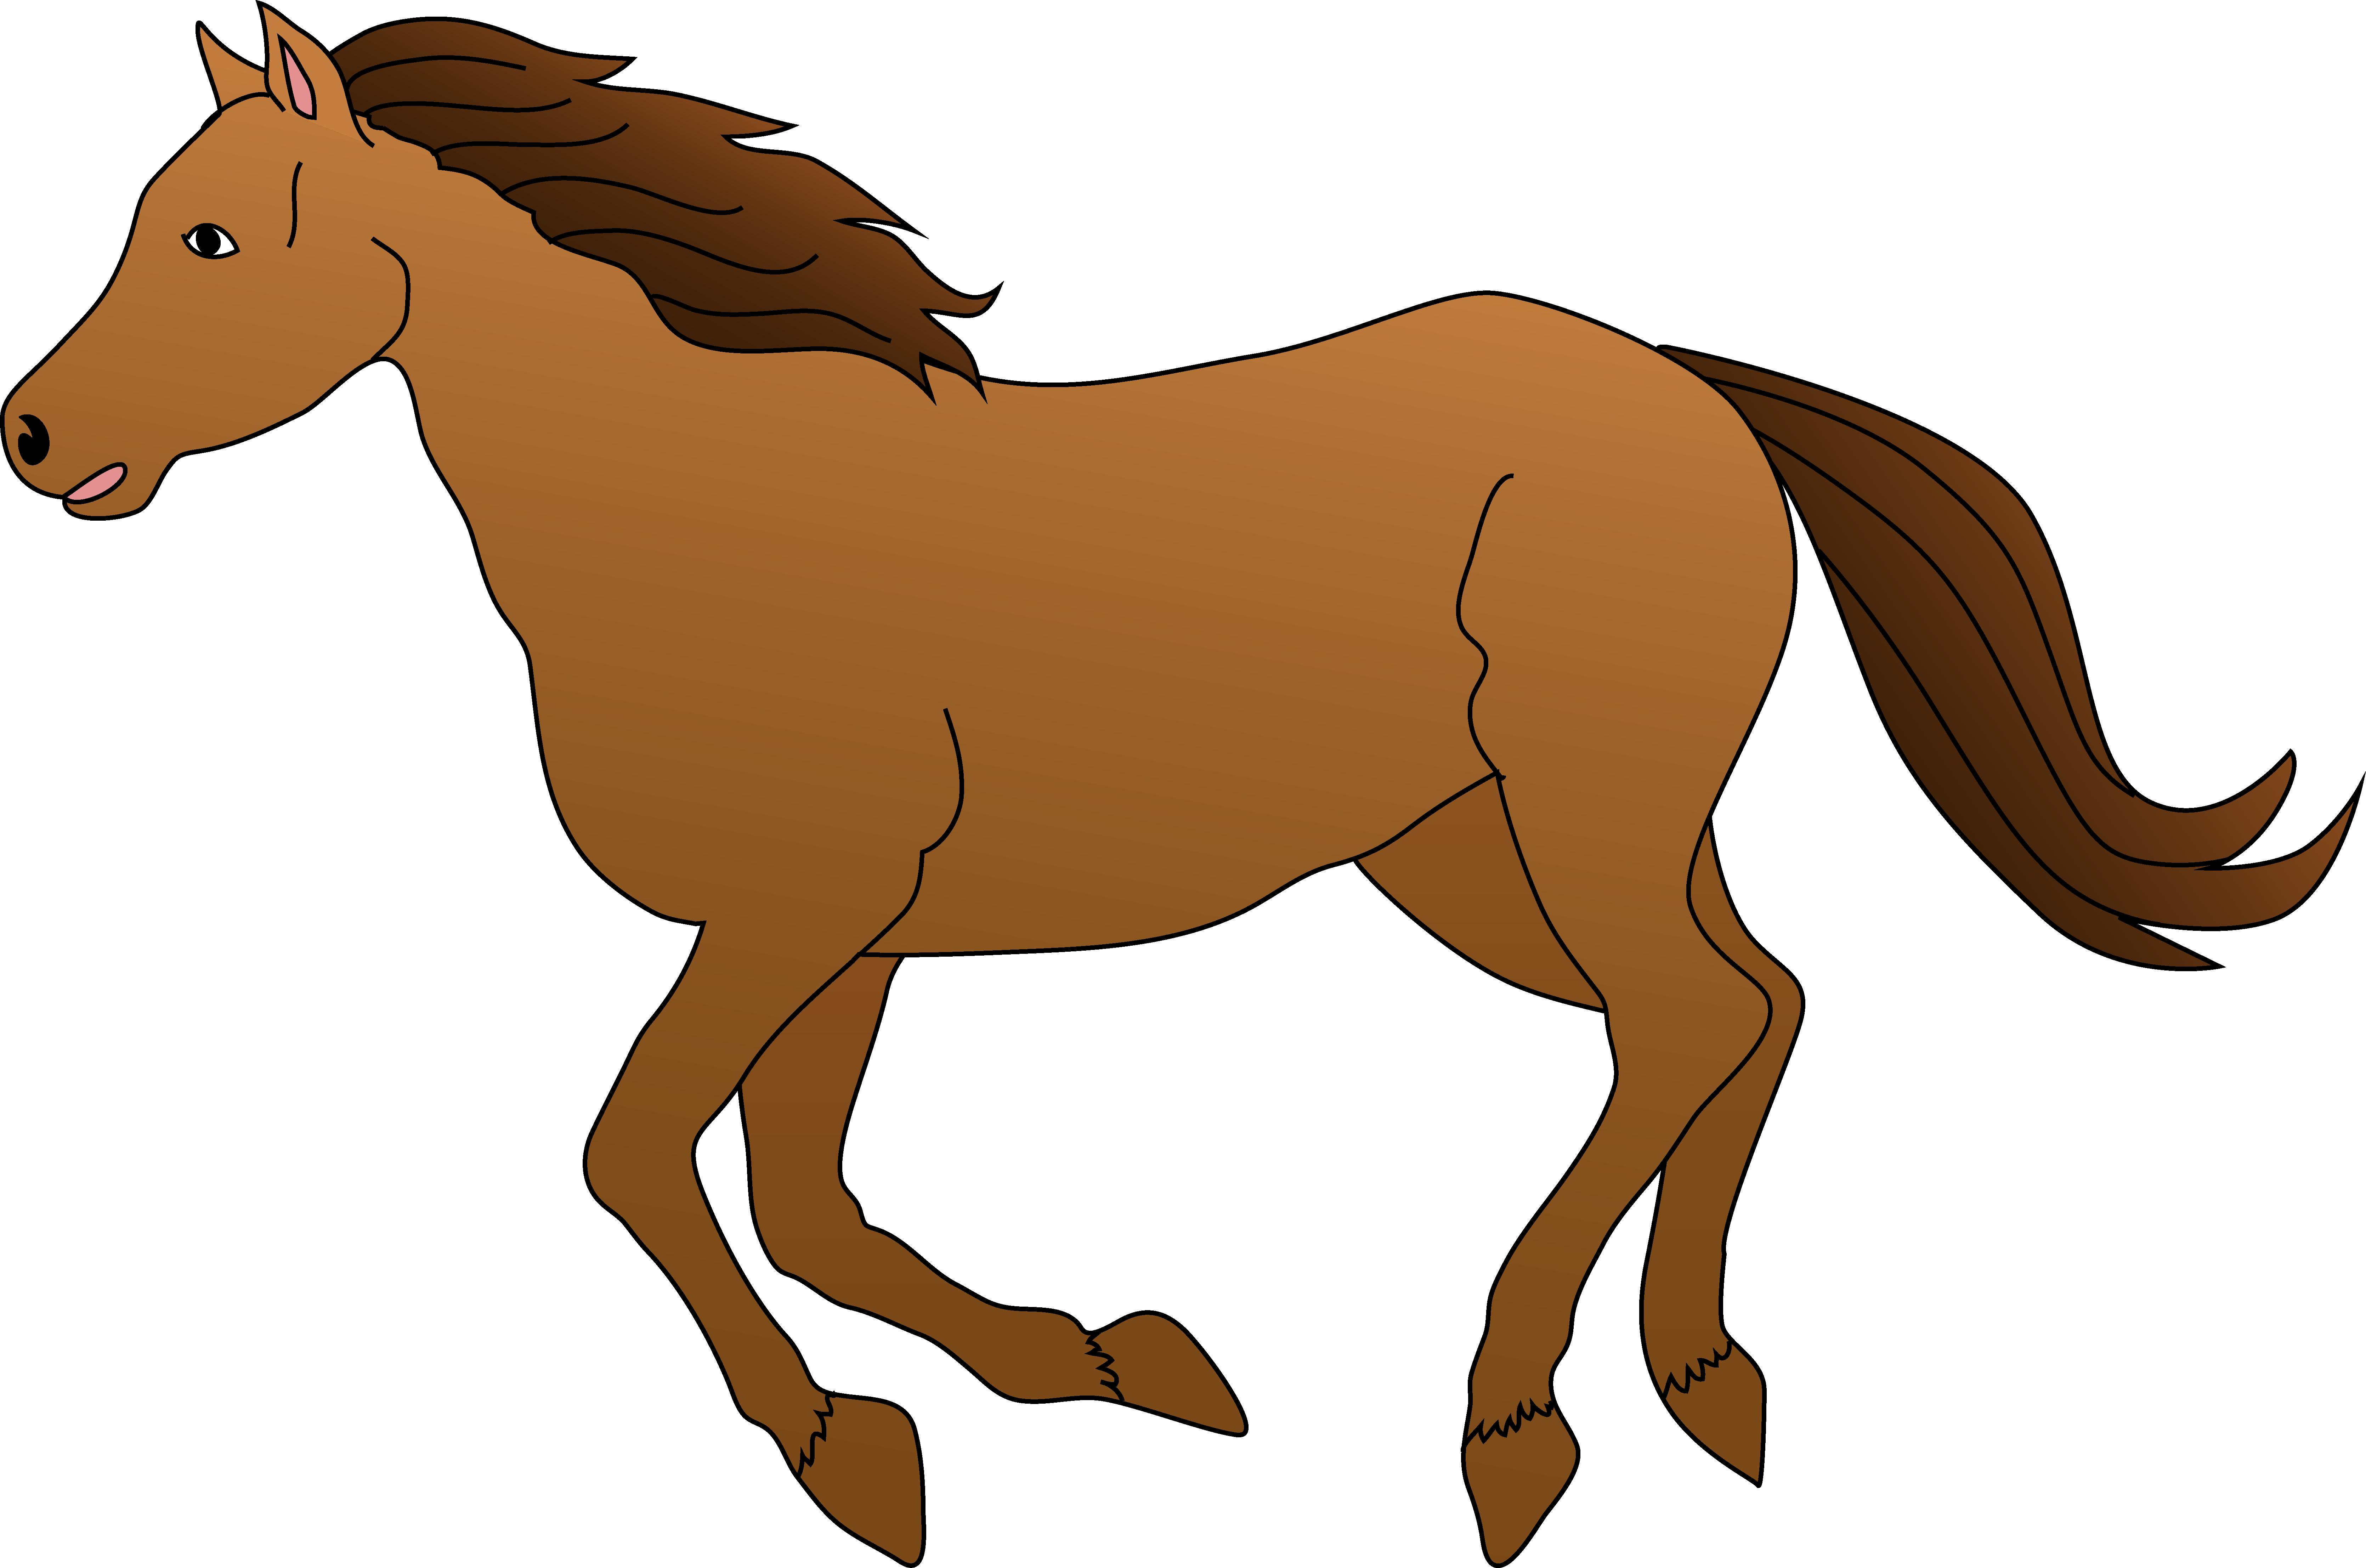 Free Horse Clip Art Pictures Horse Clip Art Horse Coloring Pages Horse Coloring [ 4427 x 6680 Pixel ]